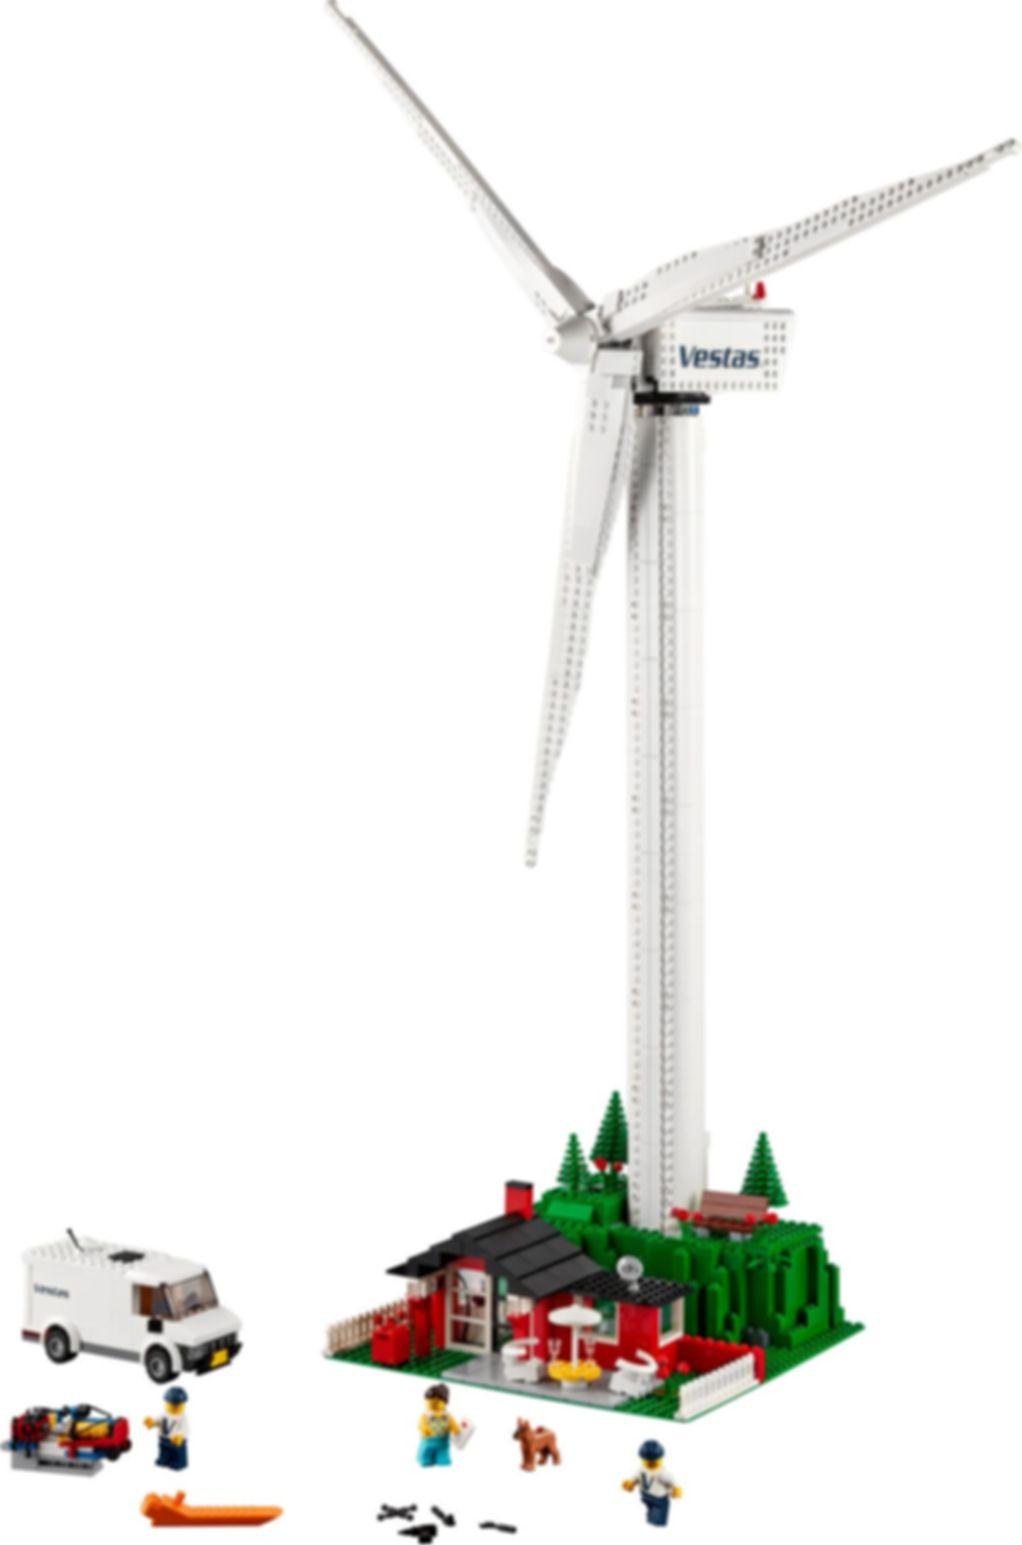 Vestas Wind Turbine components